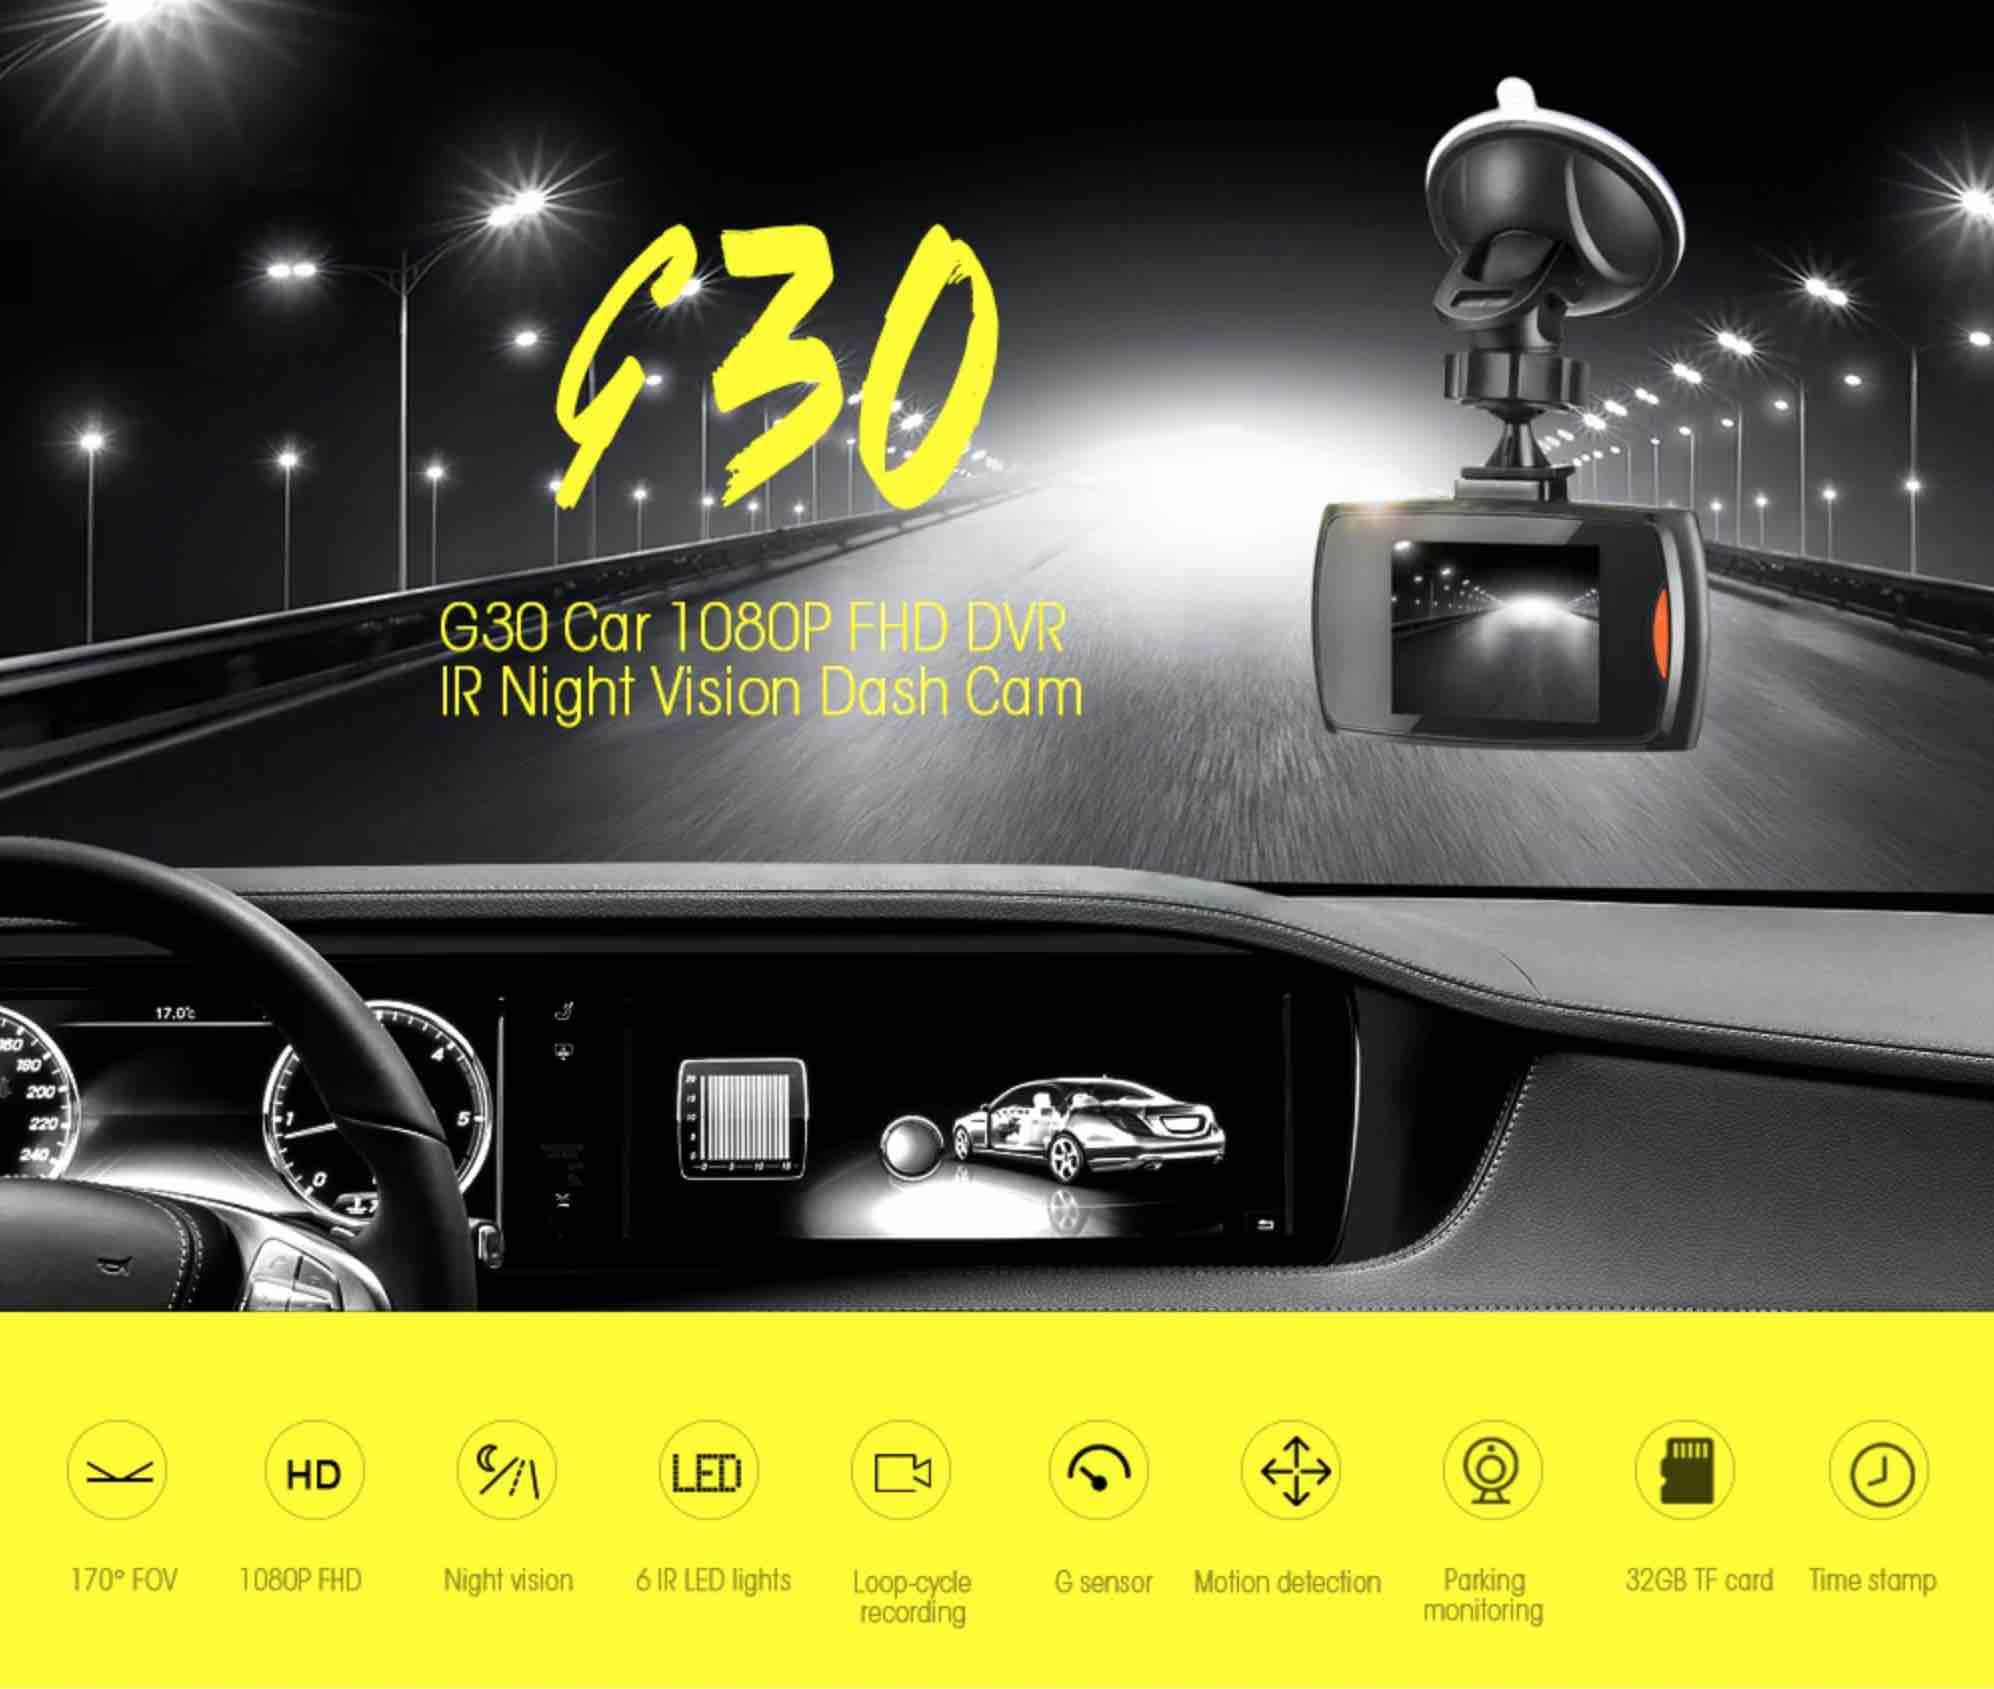 GearBest: G30 Car 1080P FHD DVR